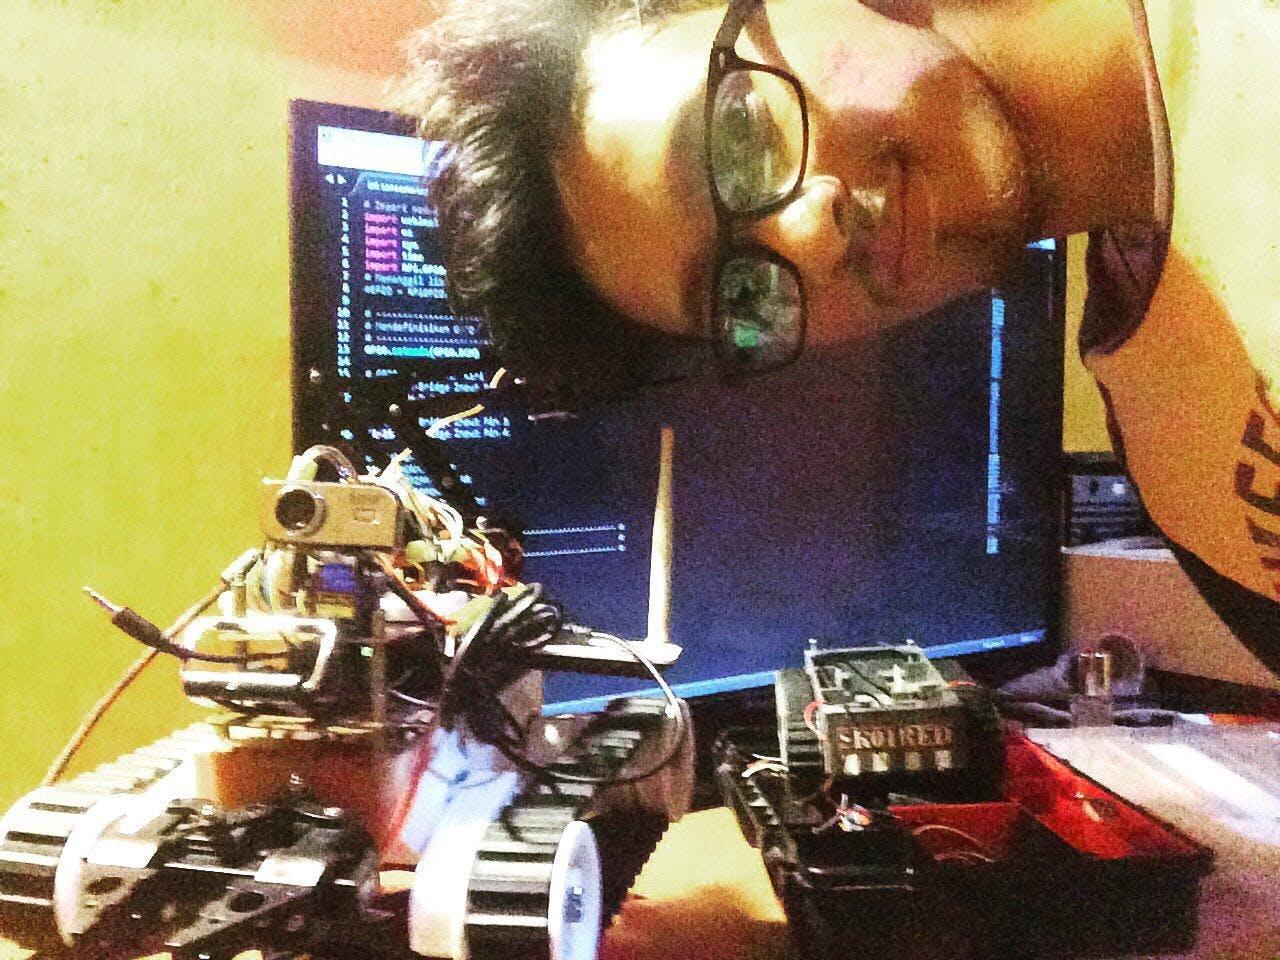 Human Assistant Robot